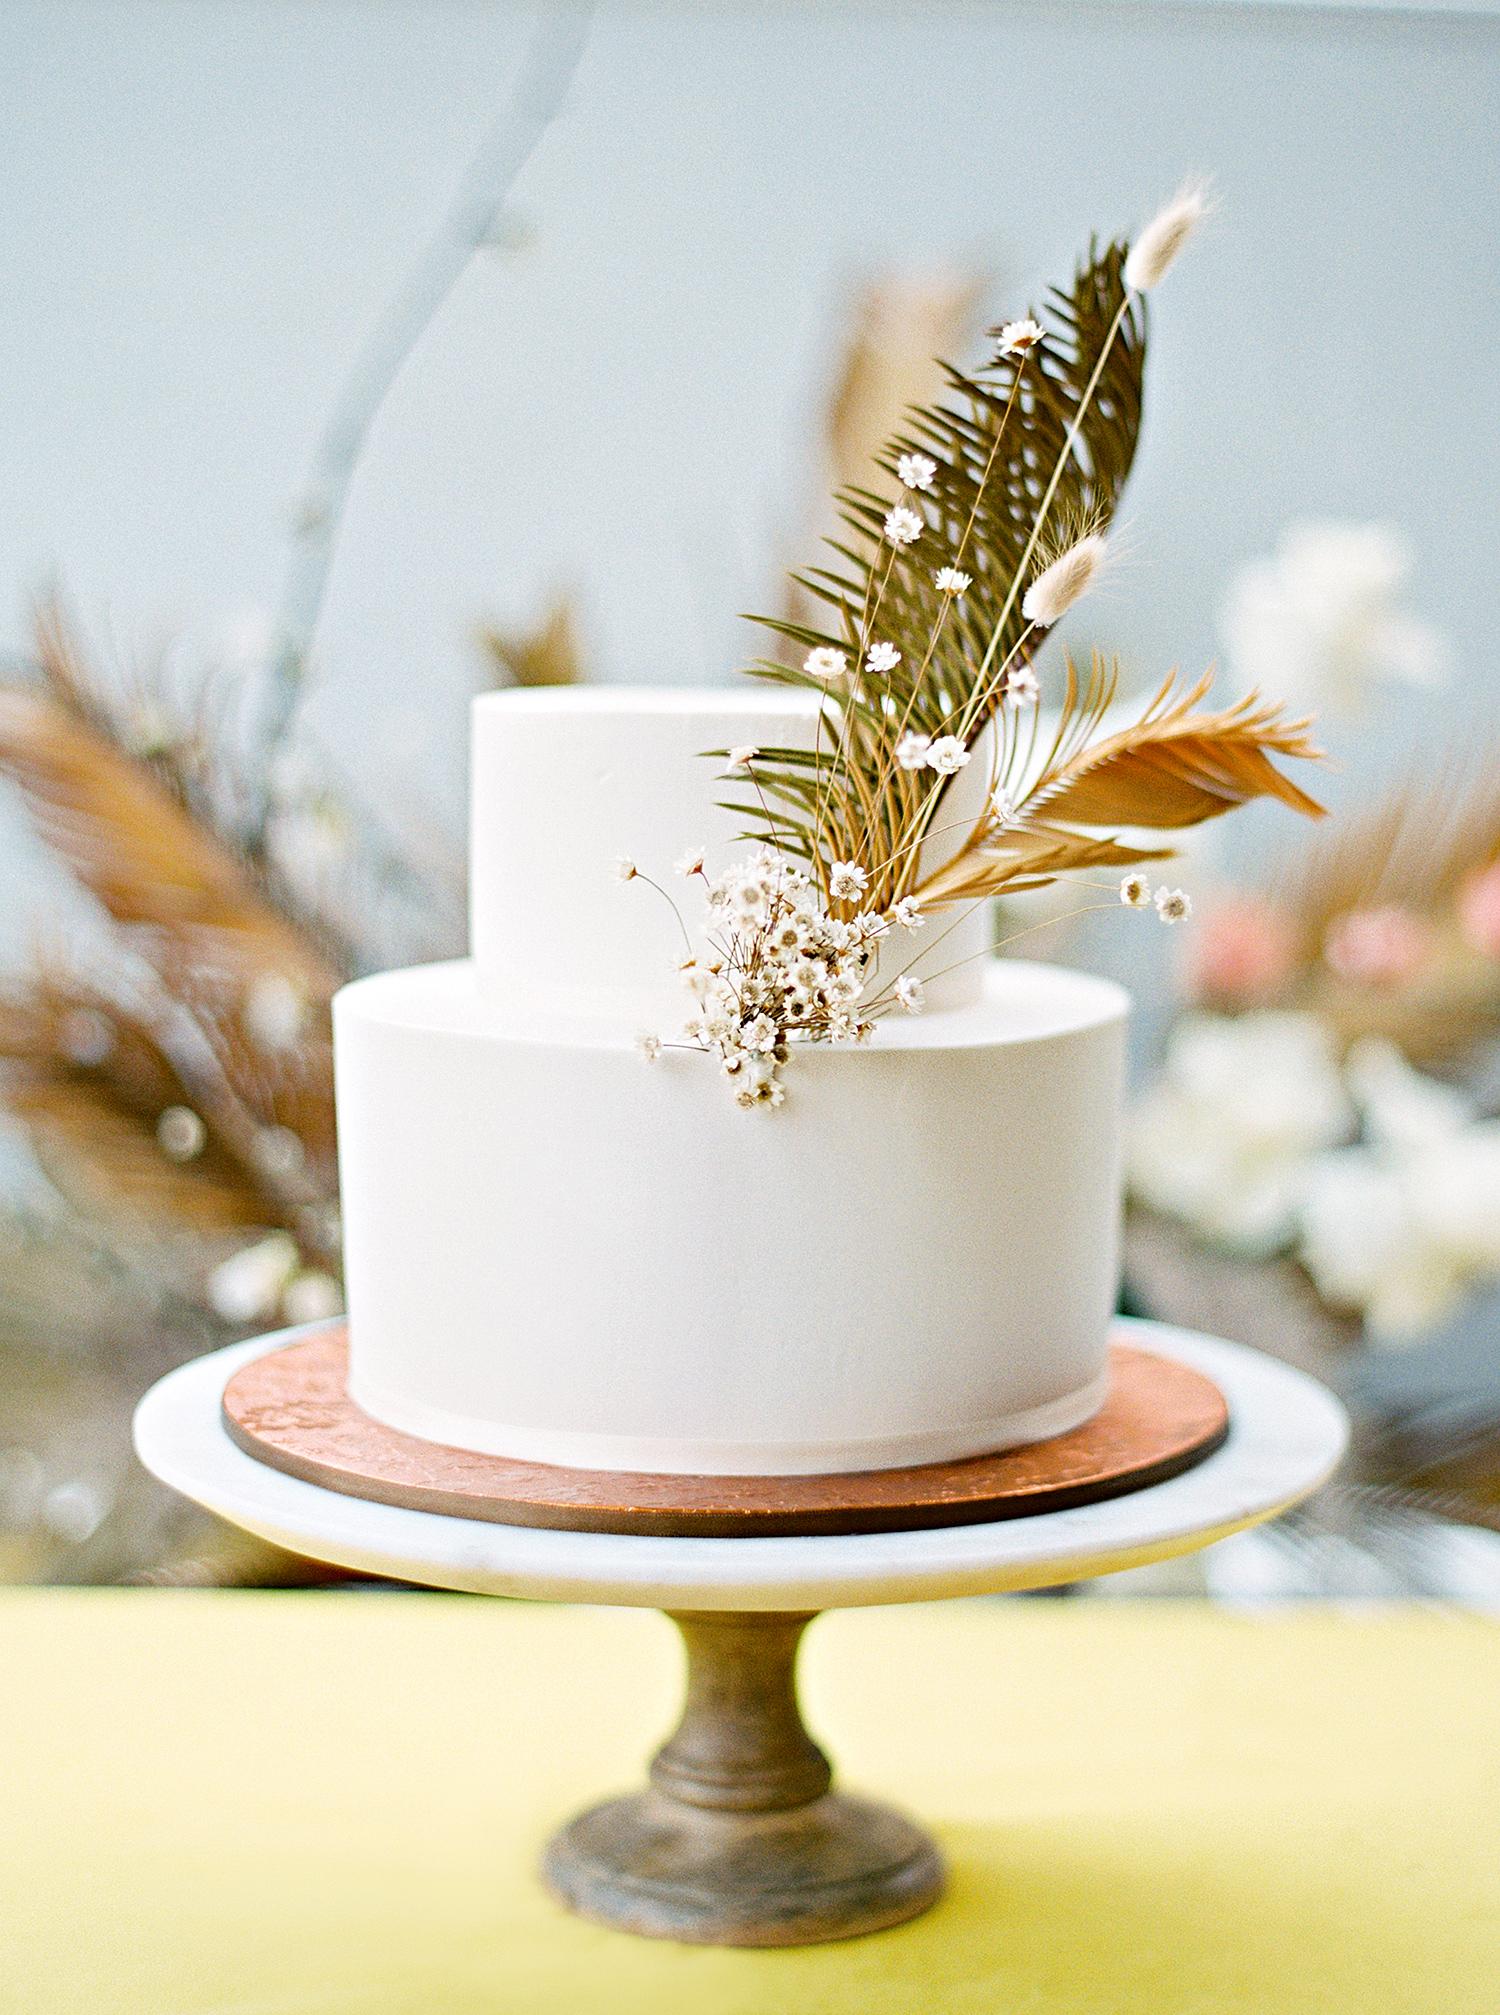 kae danny wedding simple cake